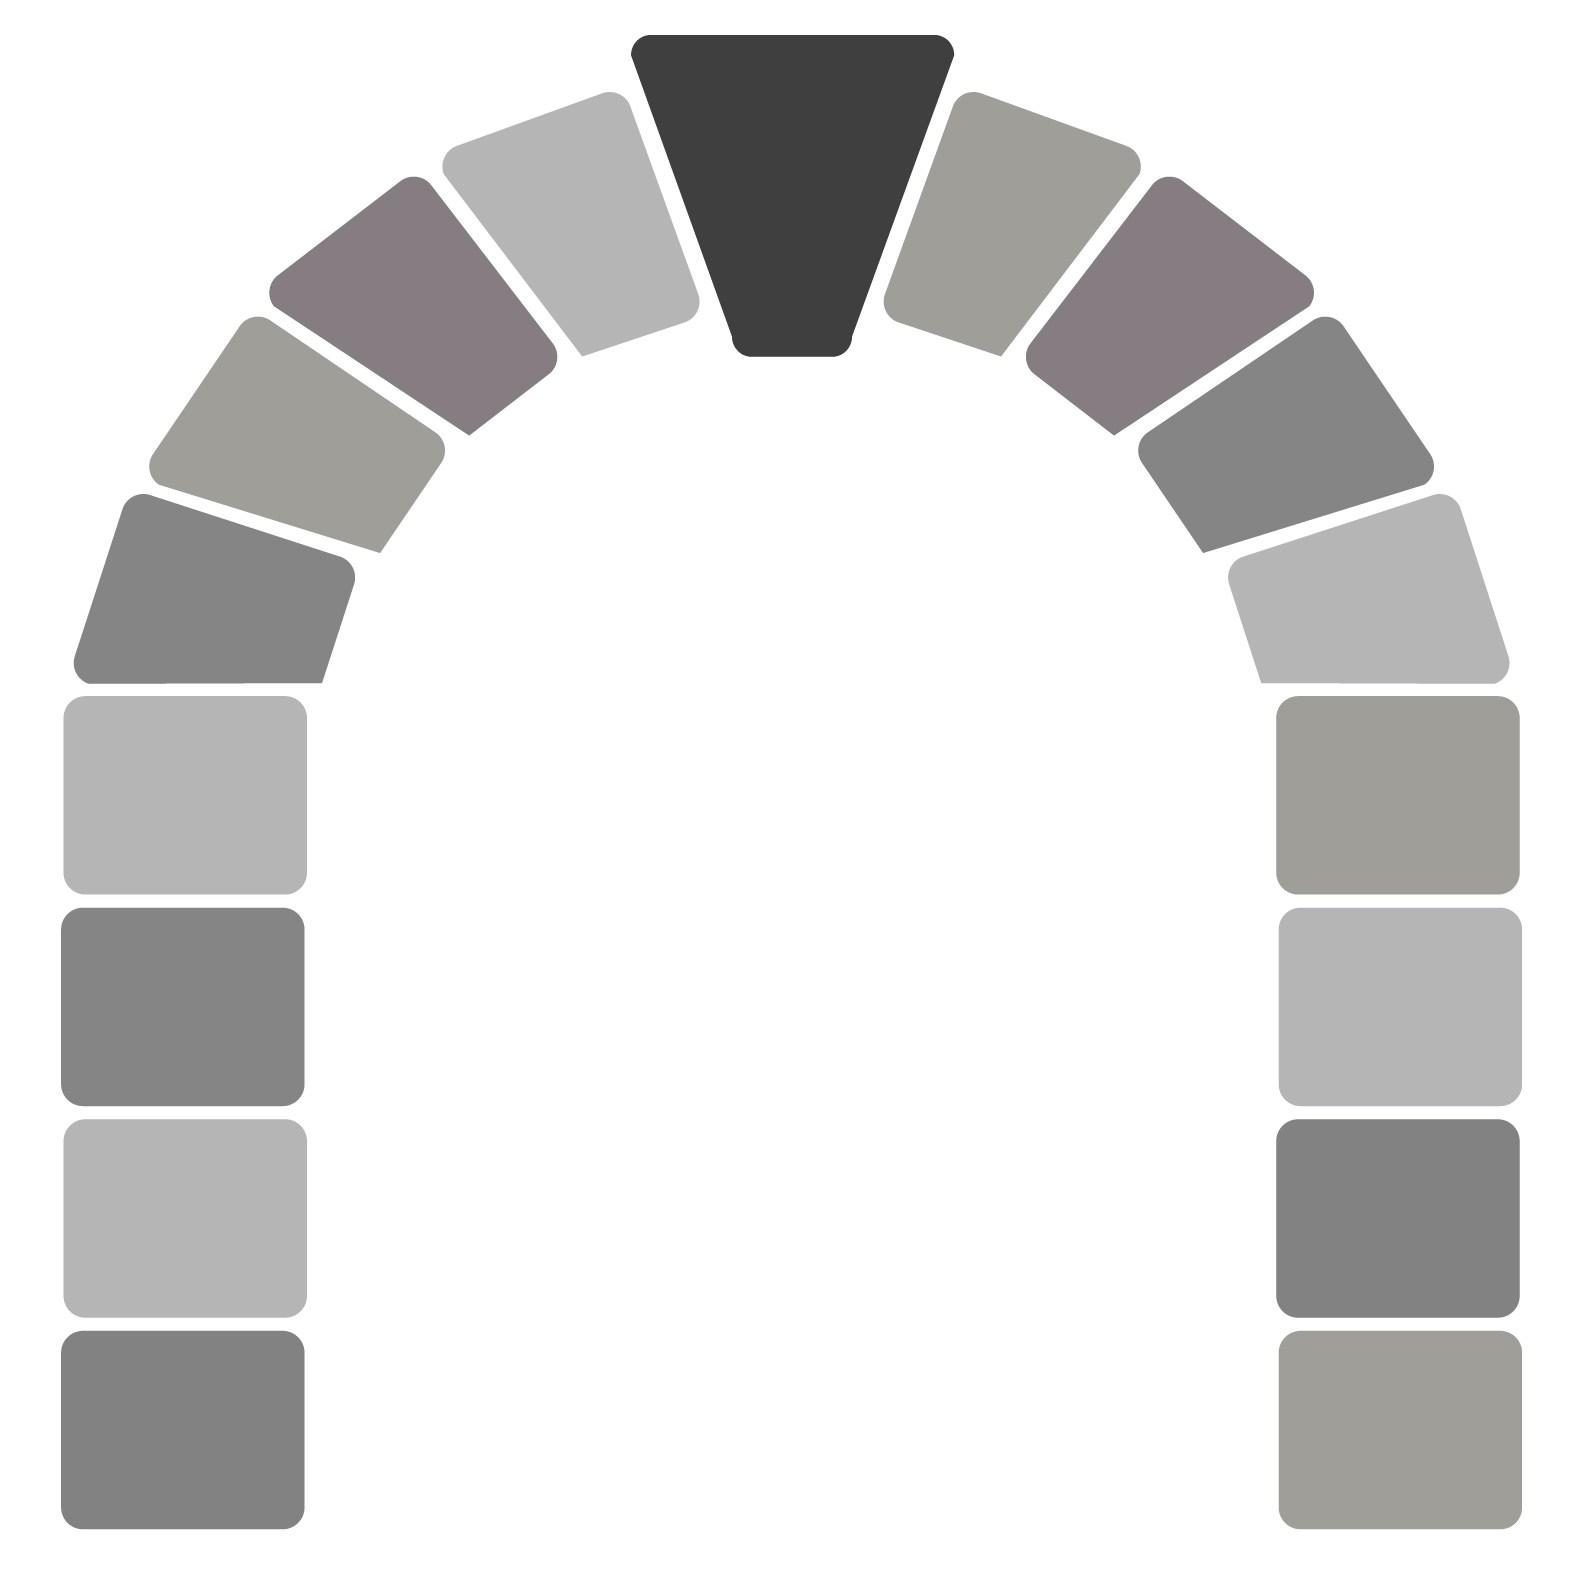 Clipart keystone 5 » Clipart Portal.